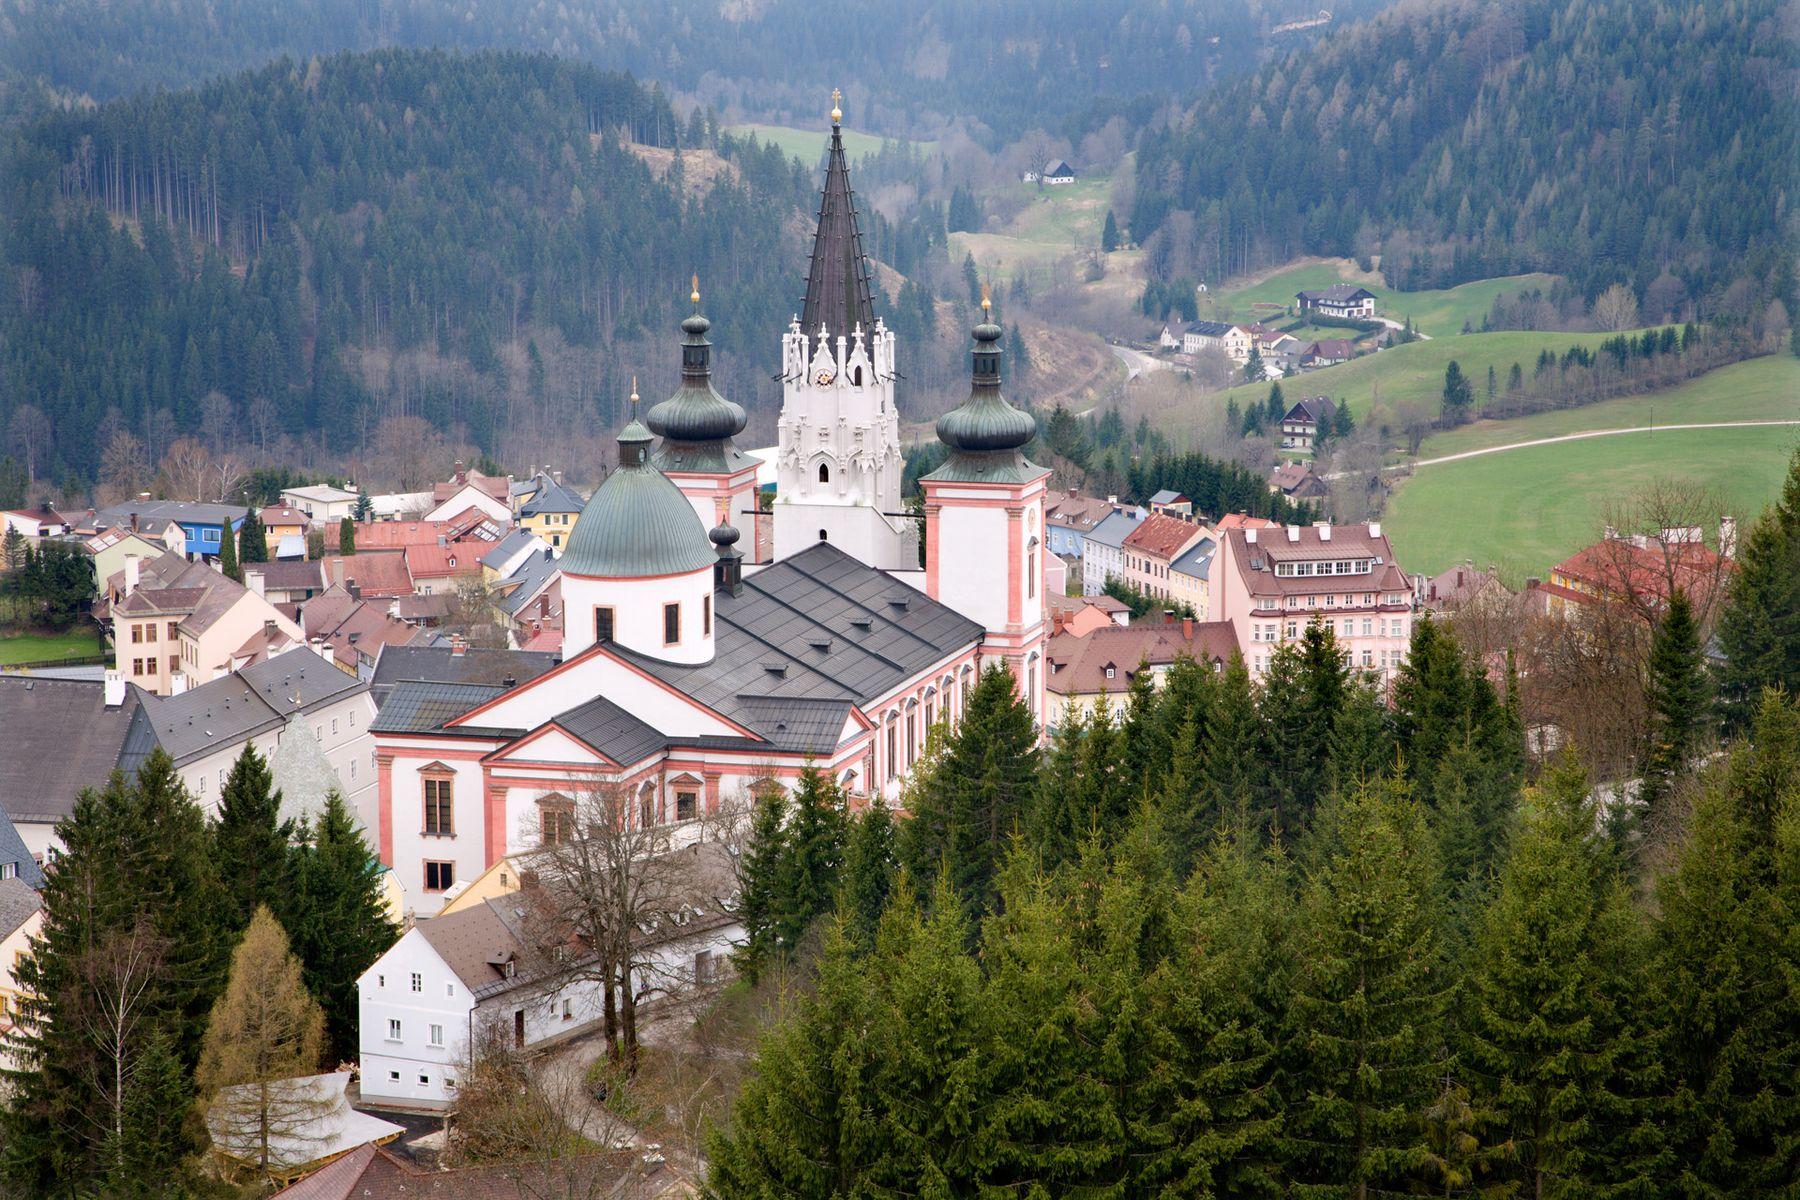 Wallfahrtsort Mariazell